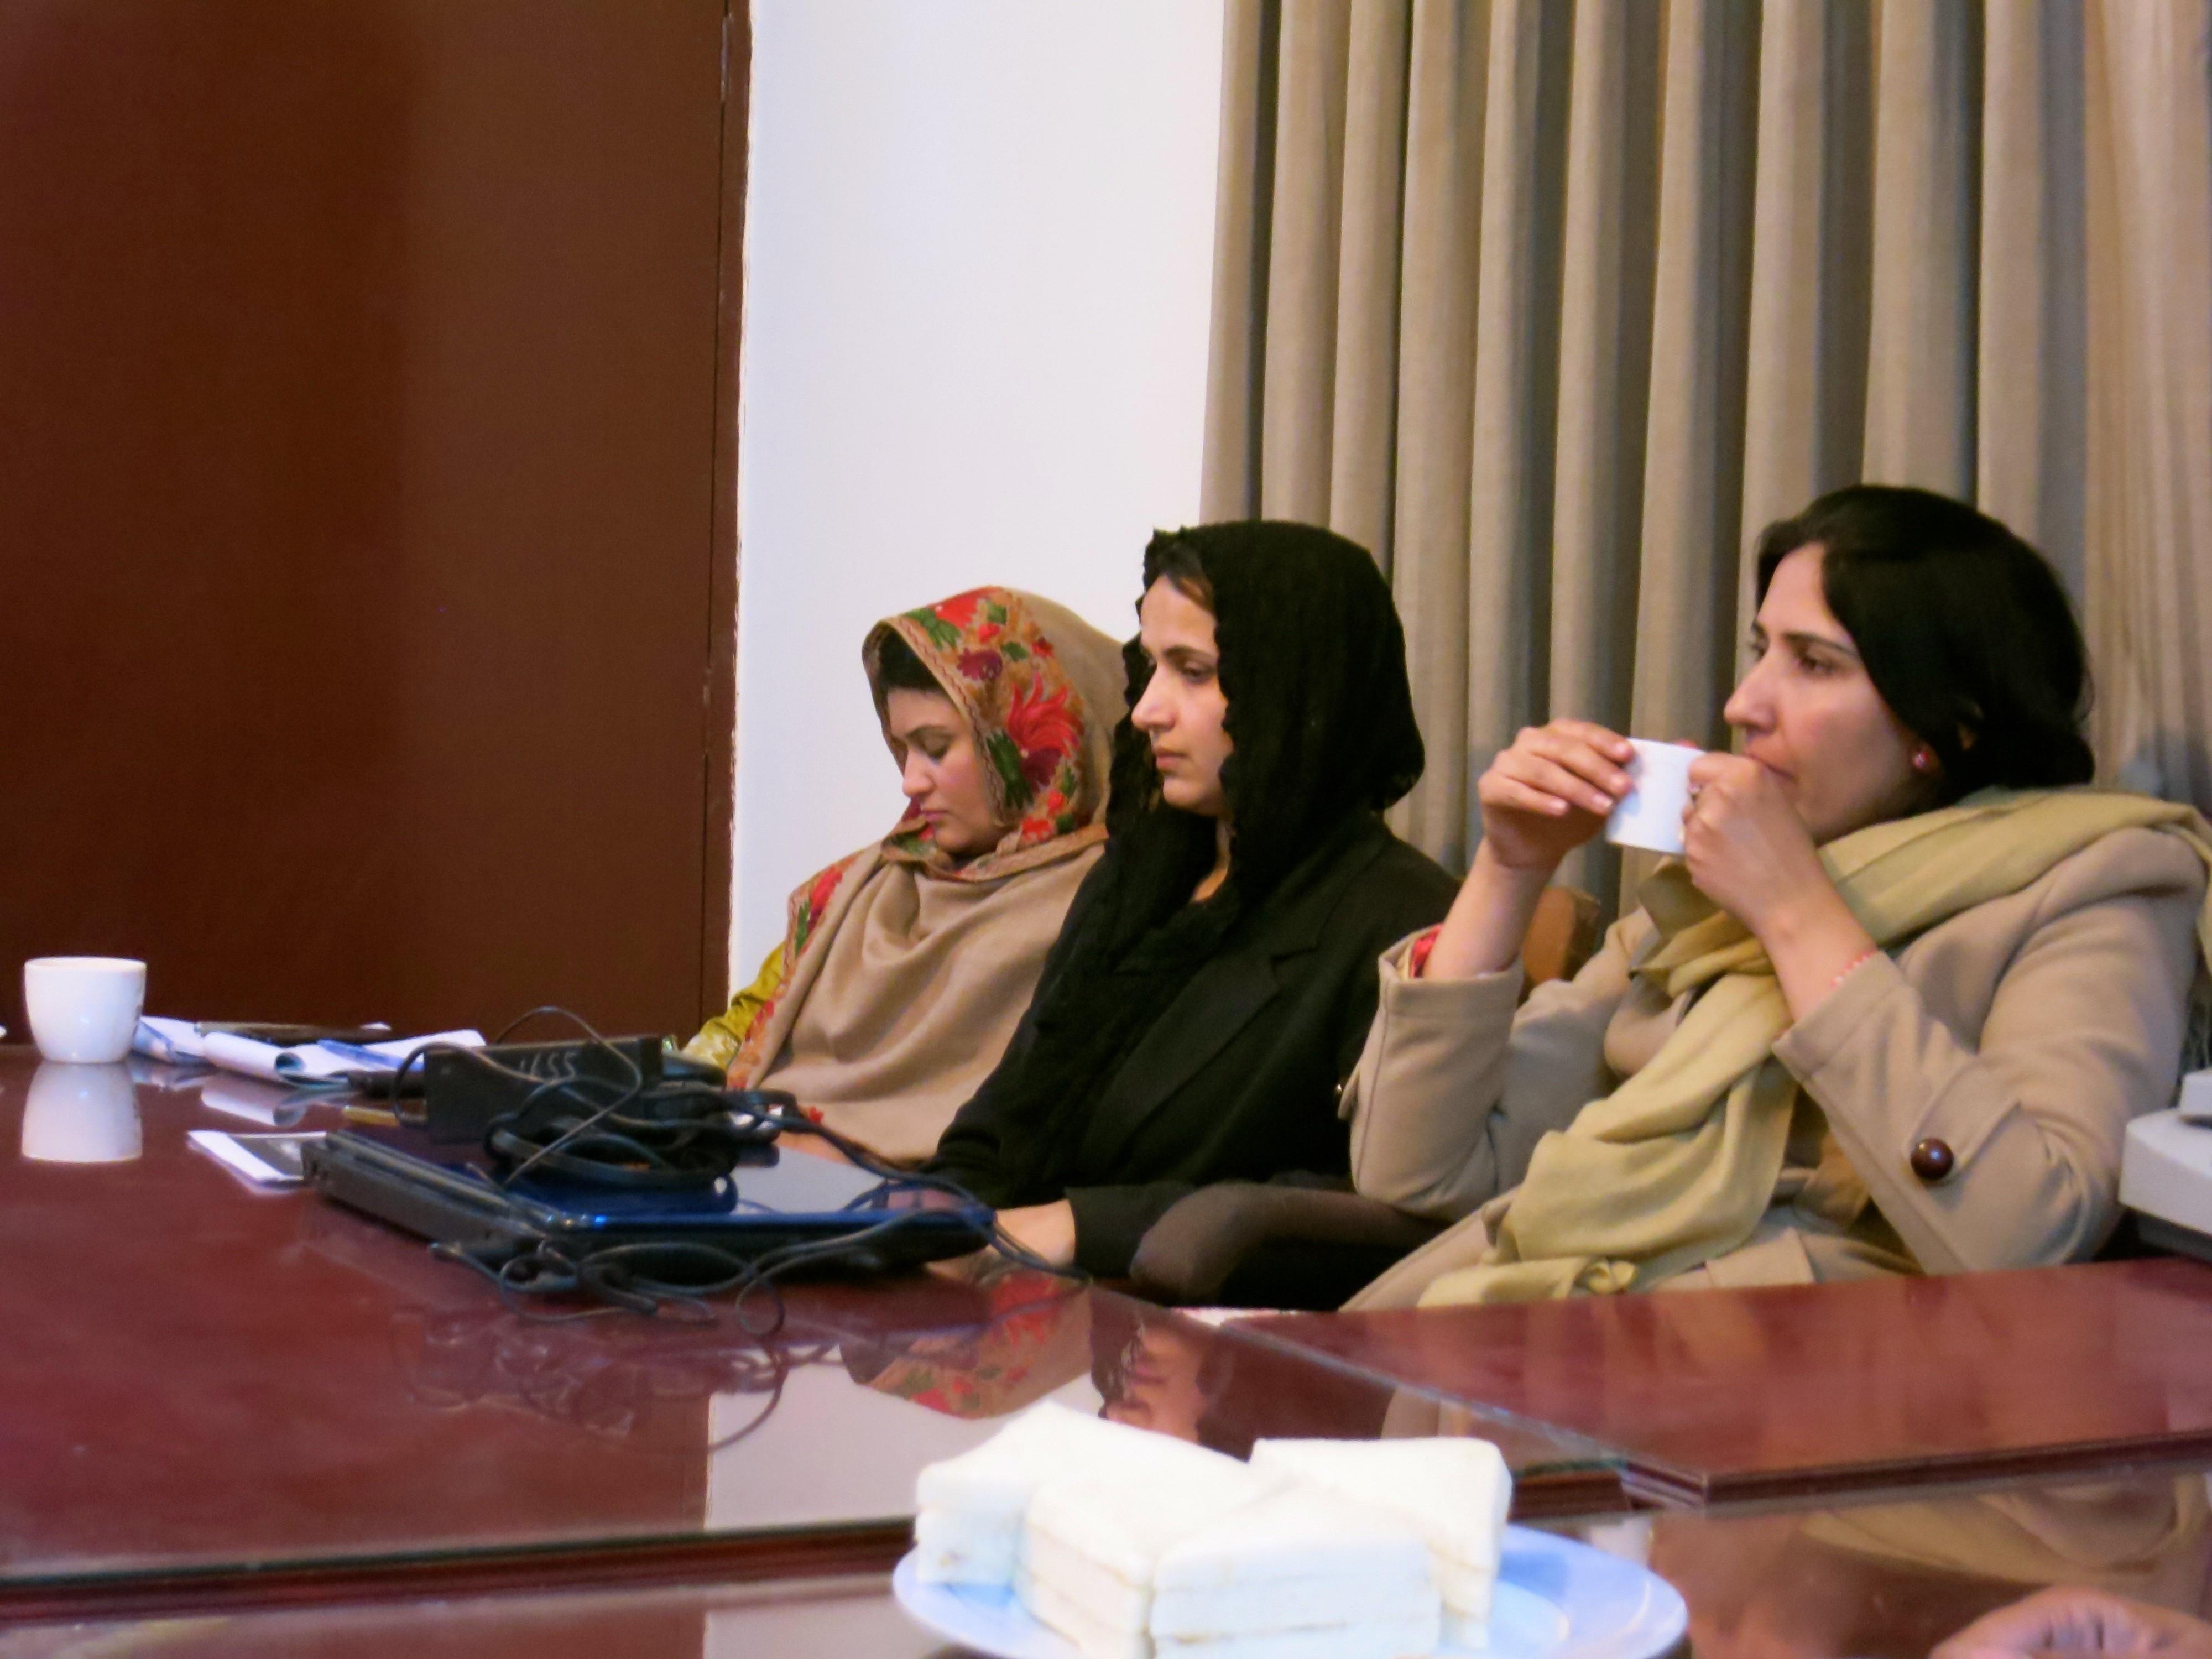 PJN International Legal Expert Visit to PJN Member Organization SHARP